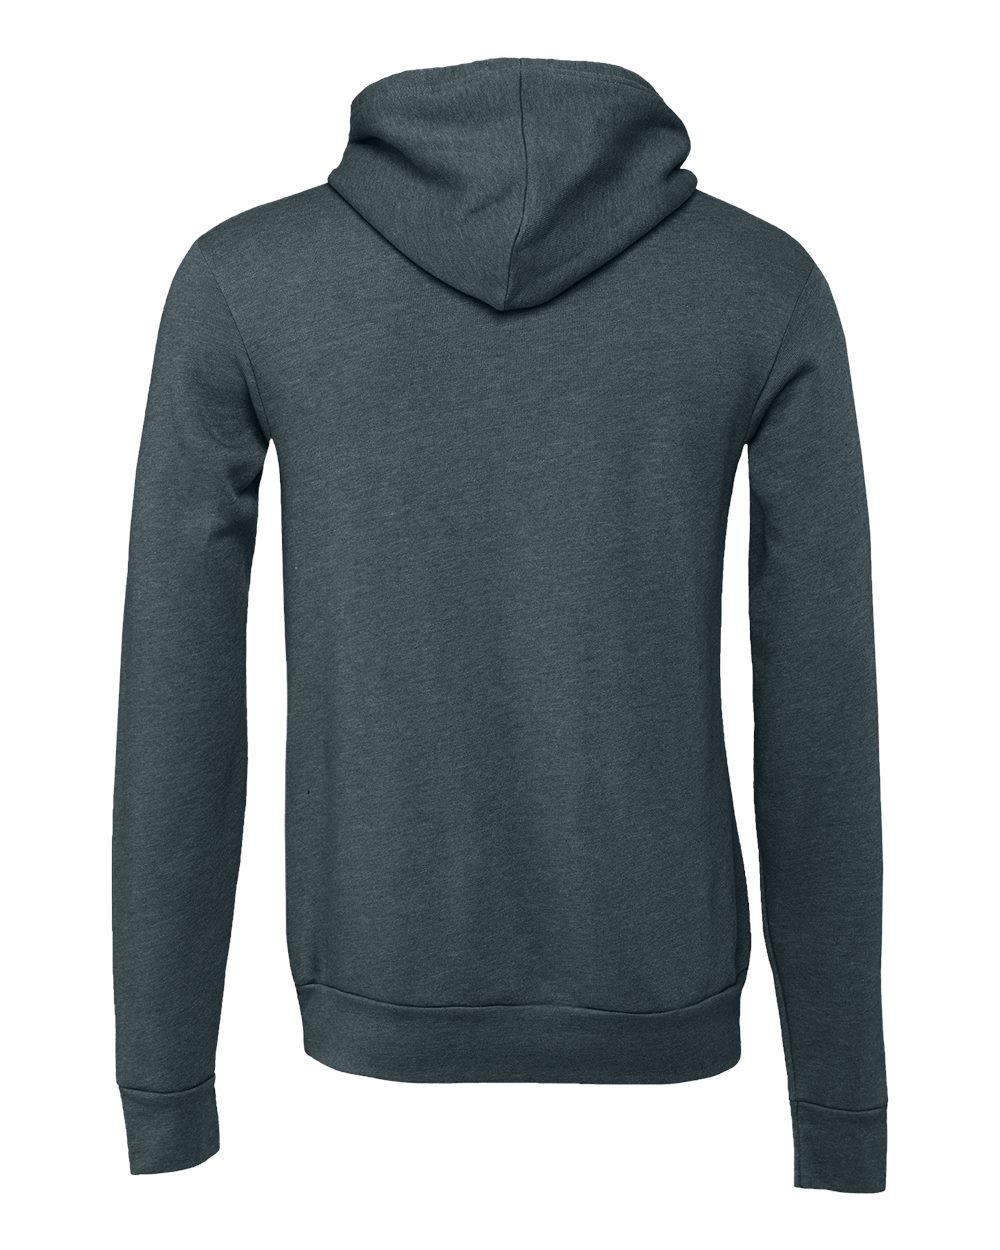 Bella-Canvas-Unisex-Sponge-Hooded-Pullover-Sweatshirt-Blank-3719-up-to-2XL thumbnail 61